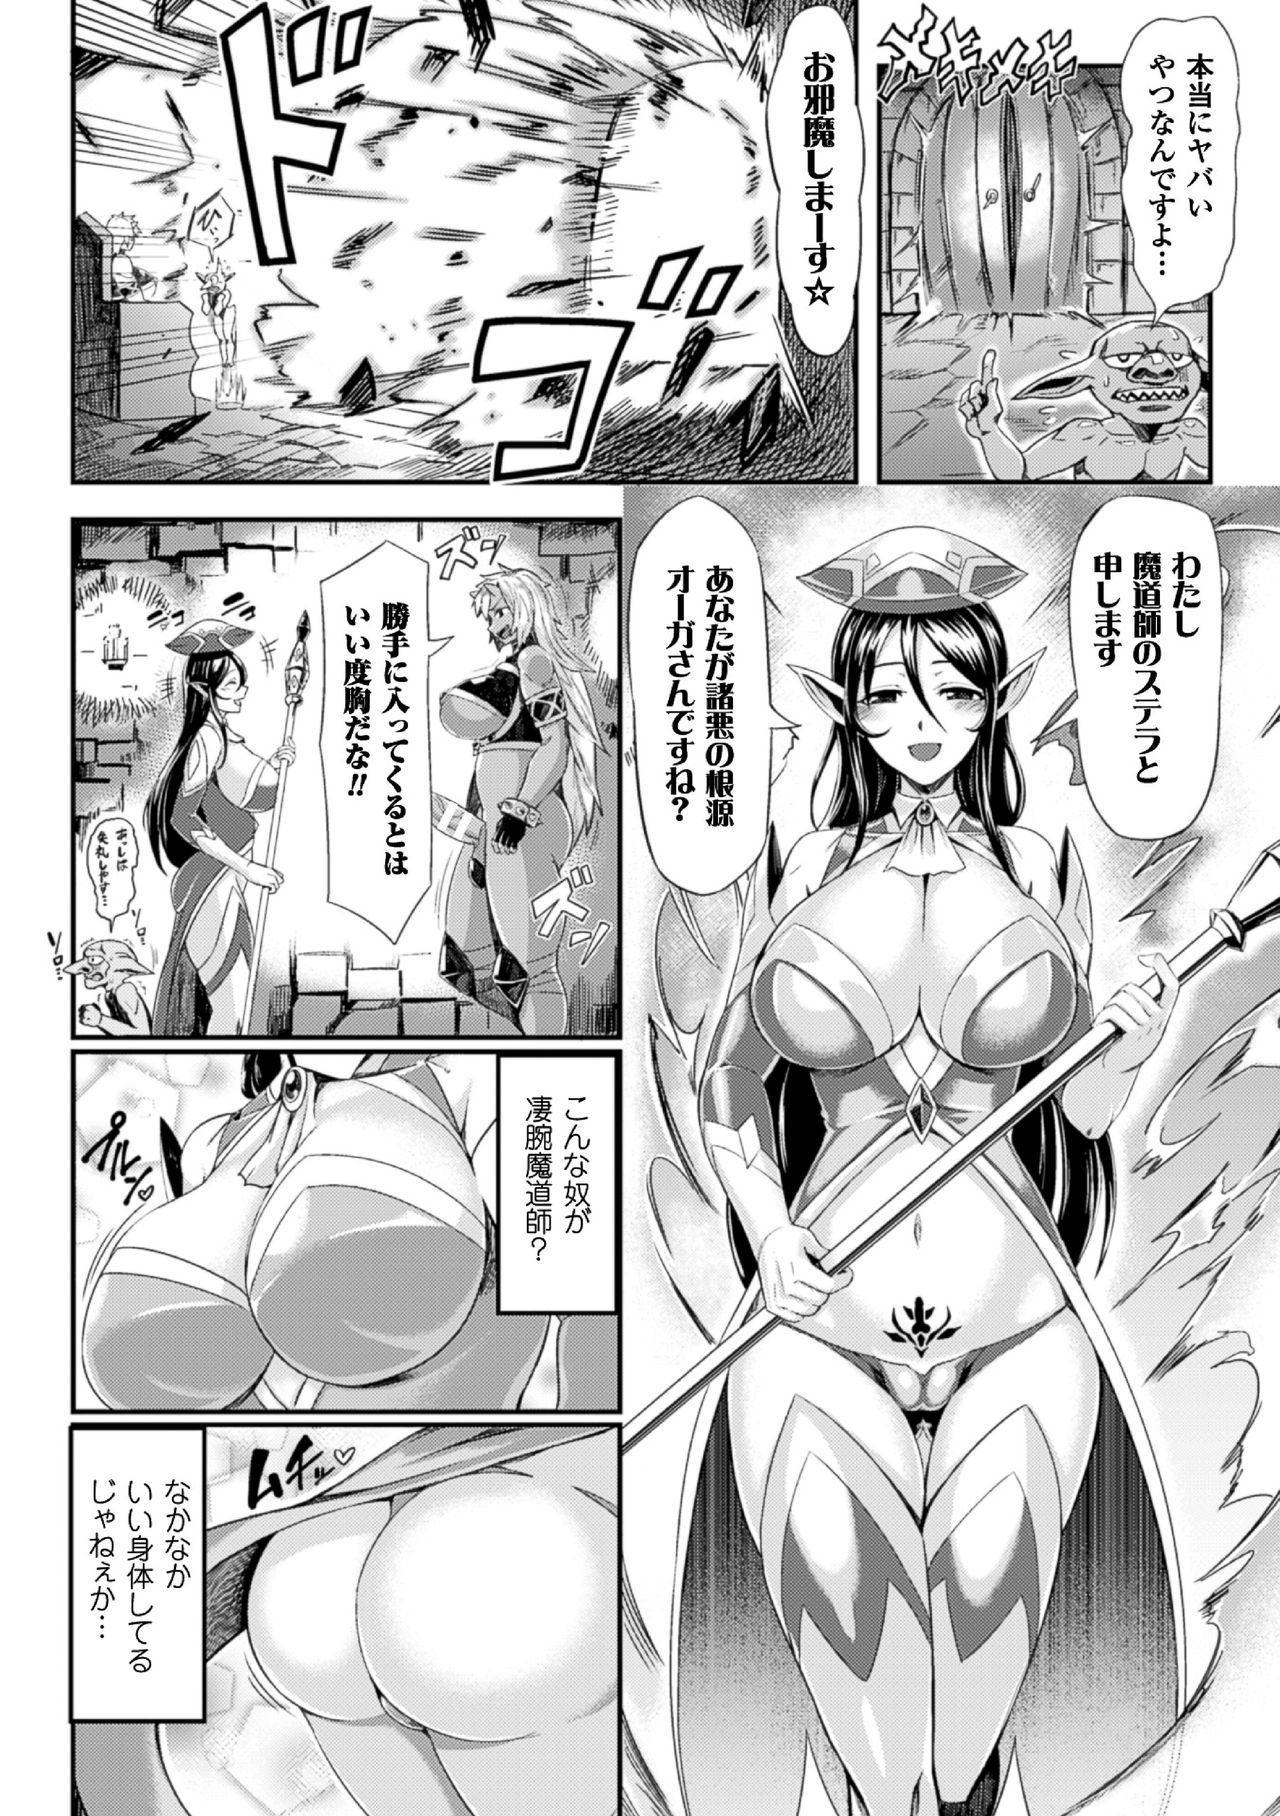 2D Comic Magazine Futanari Musume ni Nakadashi Haramase! Vol. 1 5